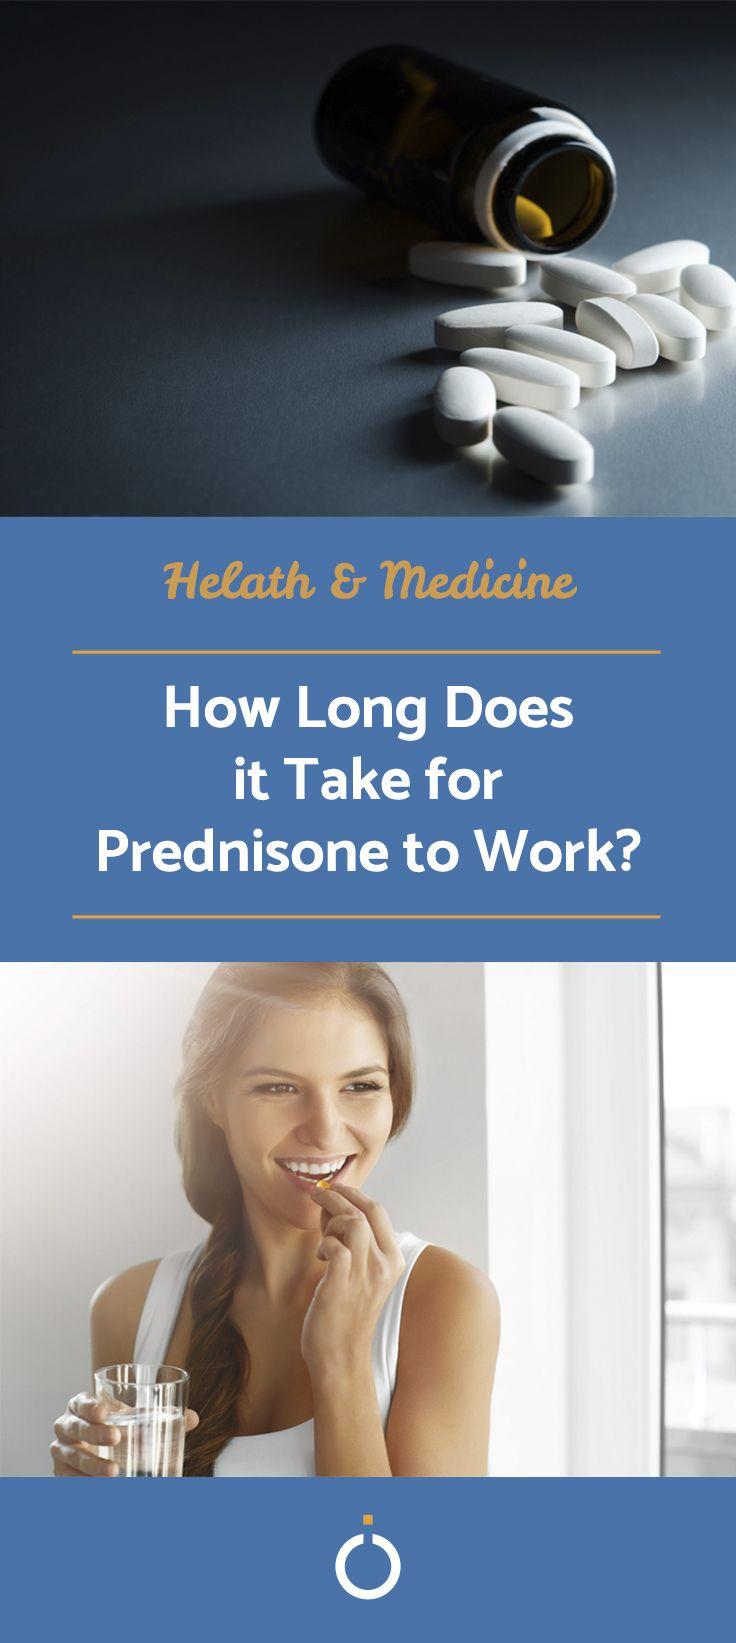 How long does it take for prednisone to work prednisone